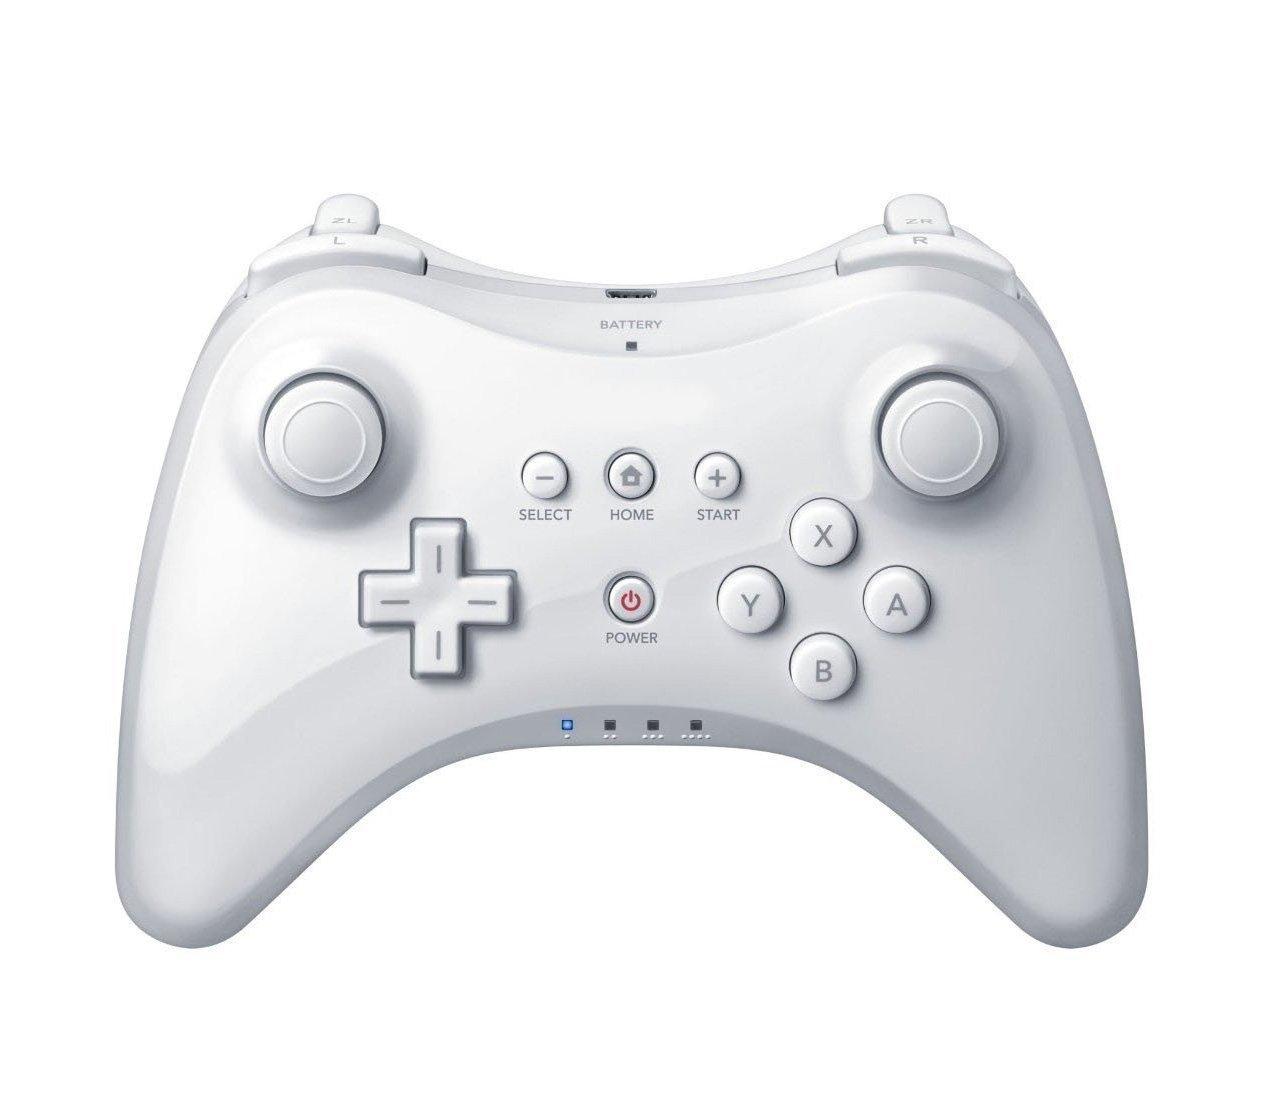 KINGAR Wireless Controller Gamepad for Nintendo Wii U Bluetooth Game Controller Joystick Gamepad